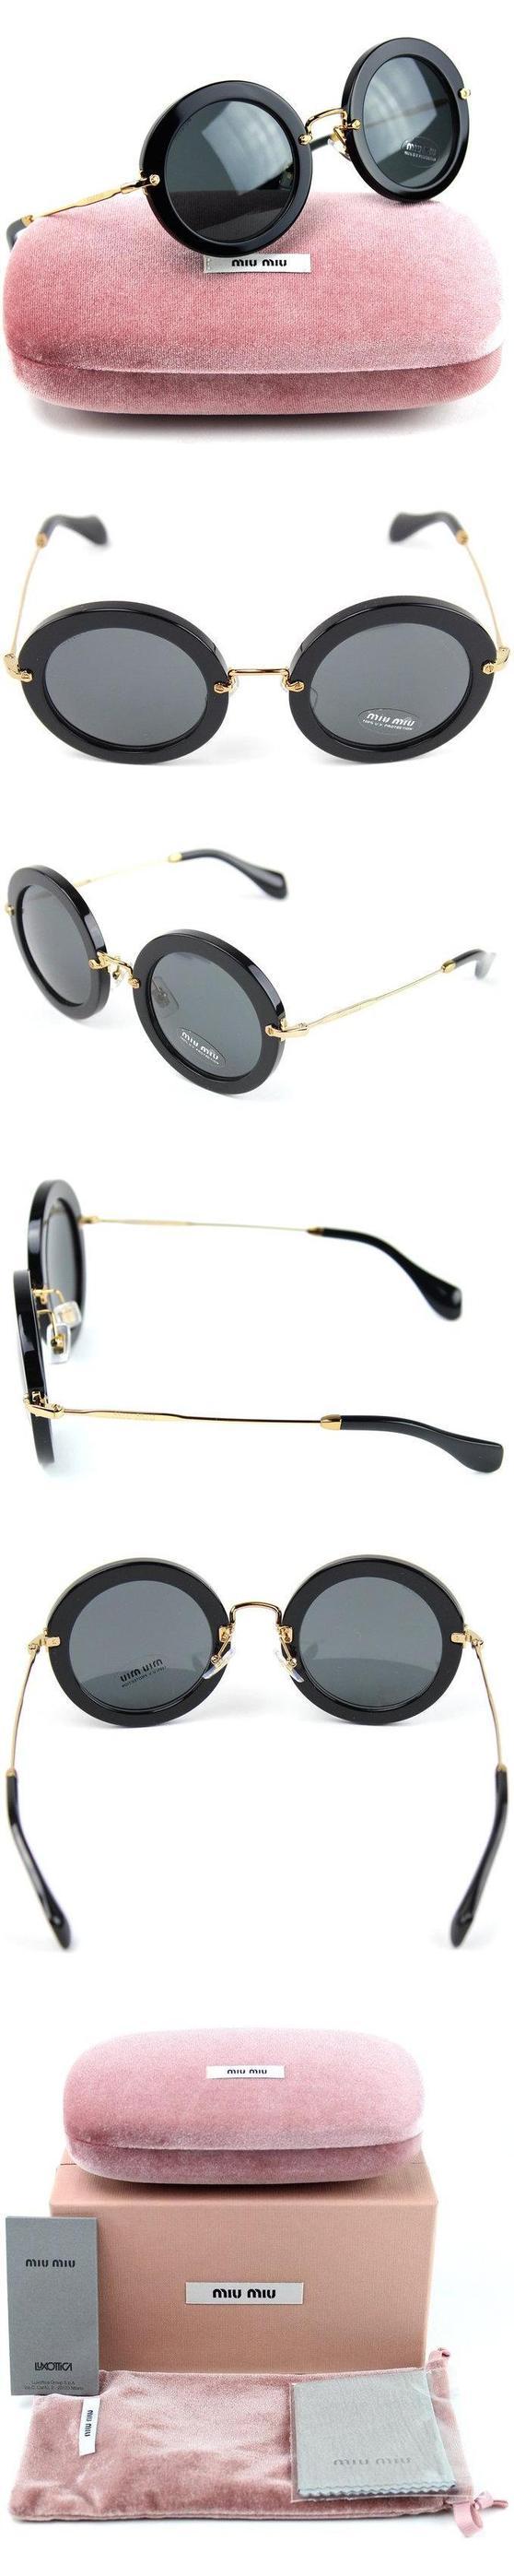 Miu Miu MU 13NS Noir Round Sunglasses Black Frame / Grey Lens (1AB/1A1) #apparel #eyewear #miumiu #sunglasses #shops #women #departments